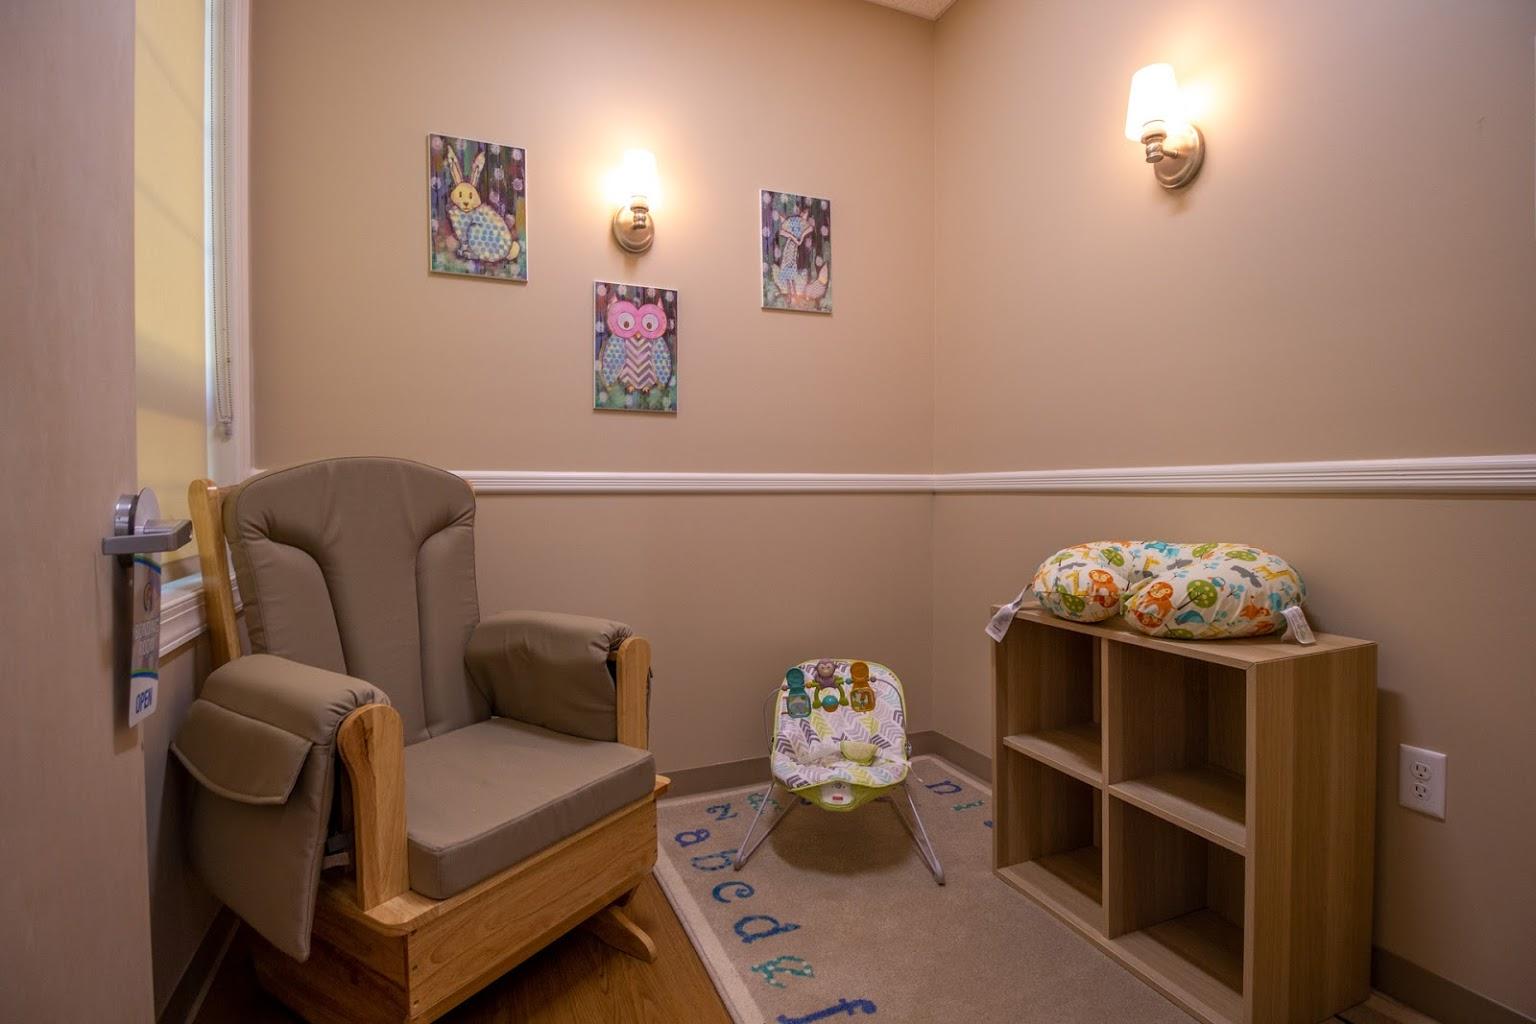 bonding room in Lightbridge Academy Day Care in South Brunswick, NJ